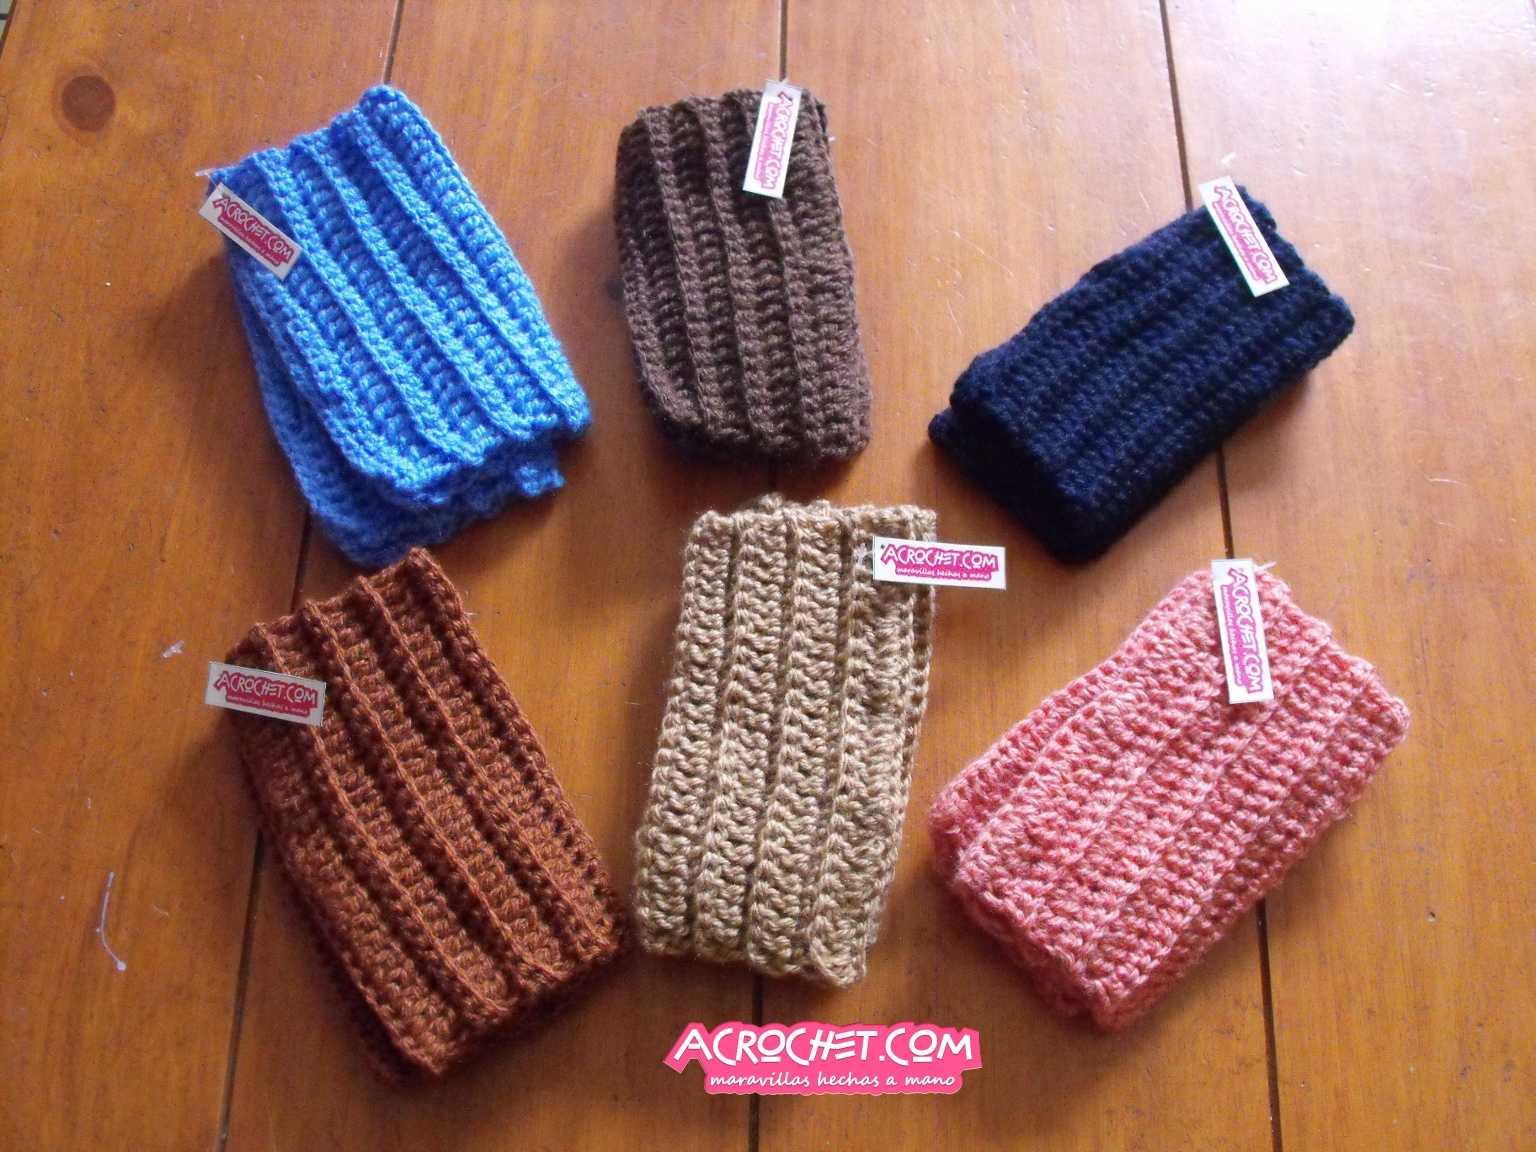 Mitones con puntos escalonados | Blog a Crochet - ACrochet